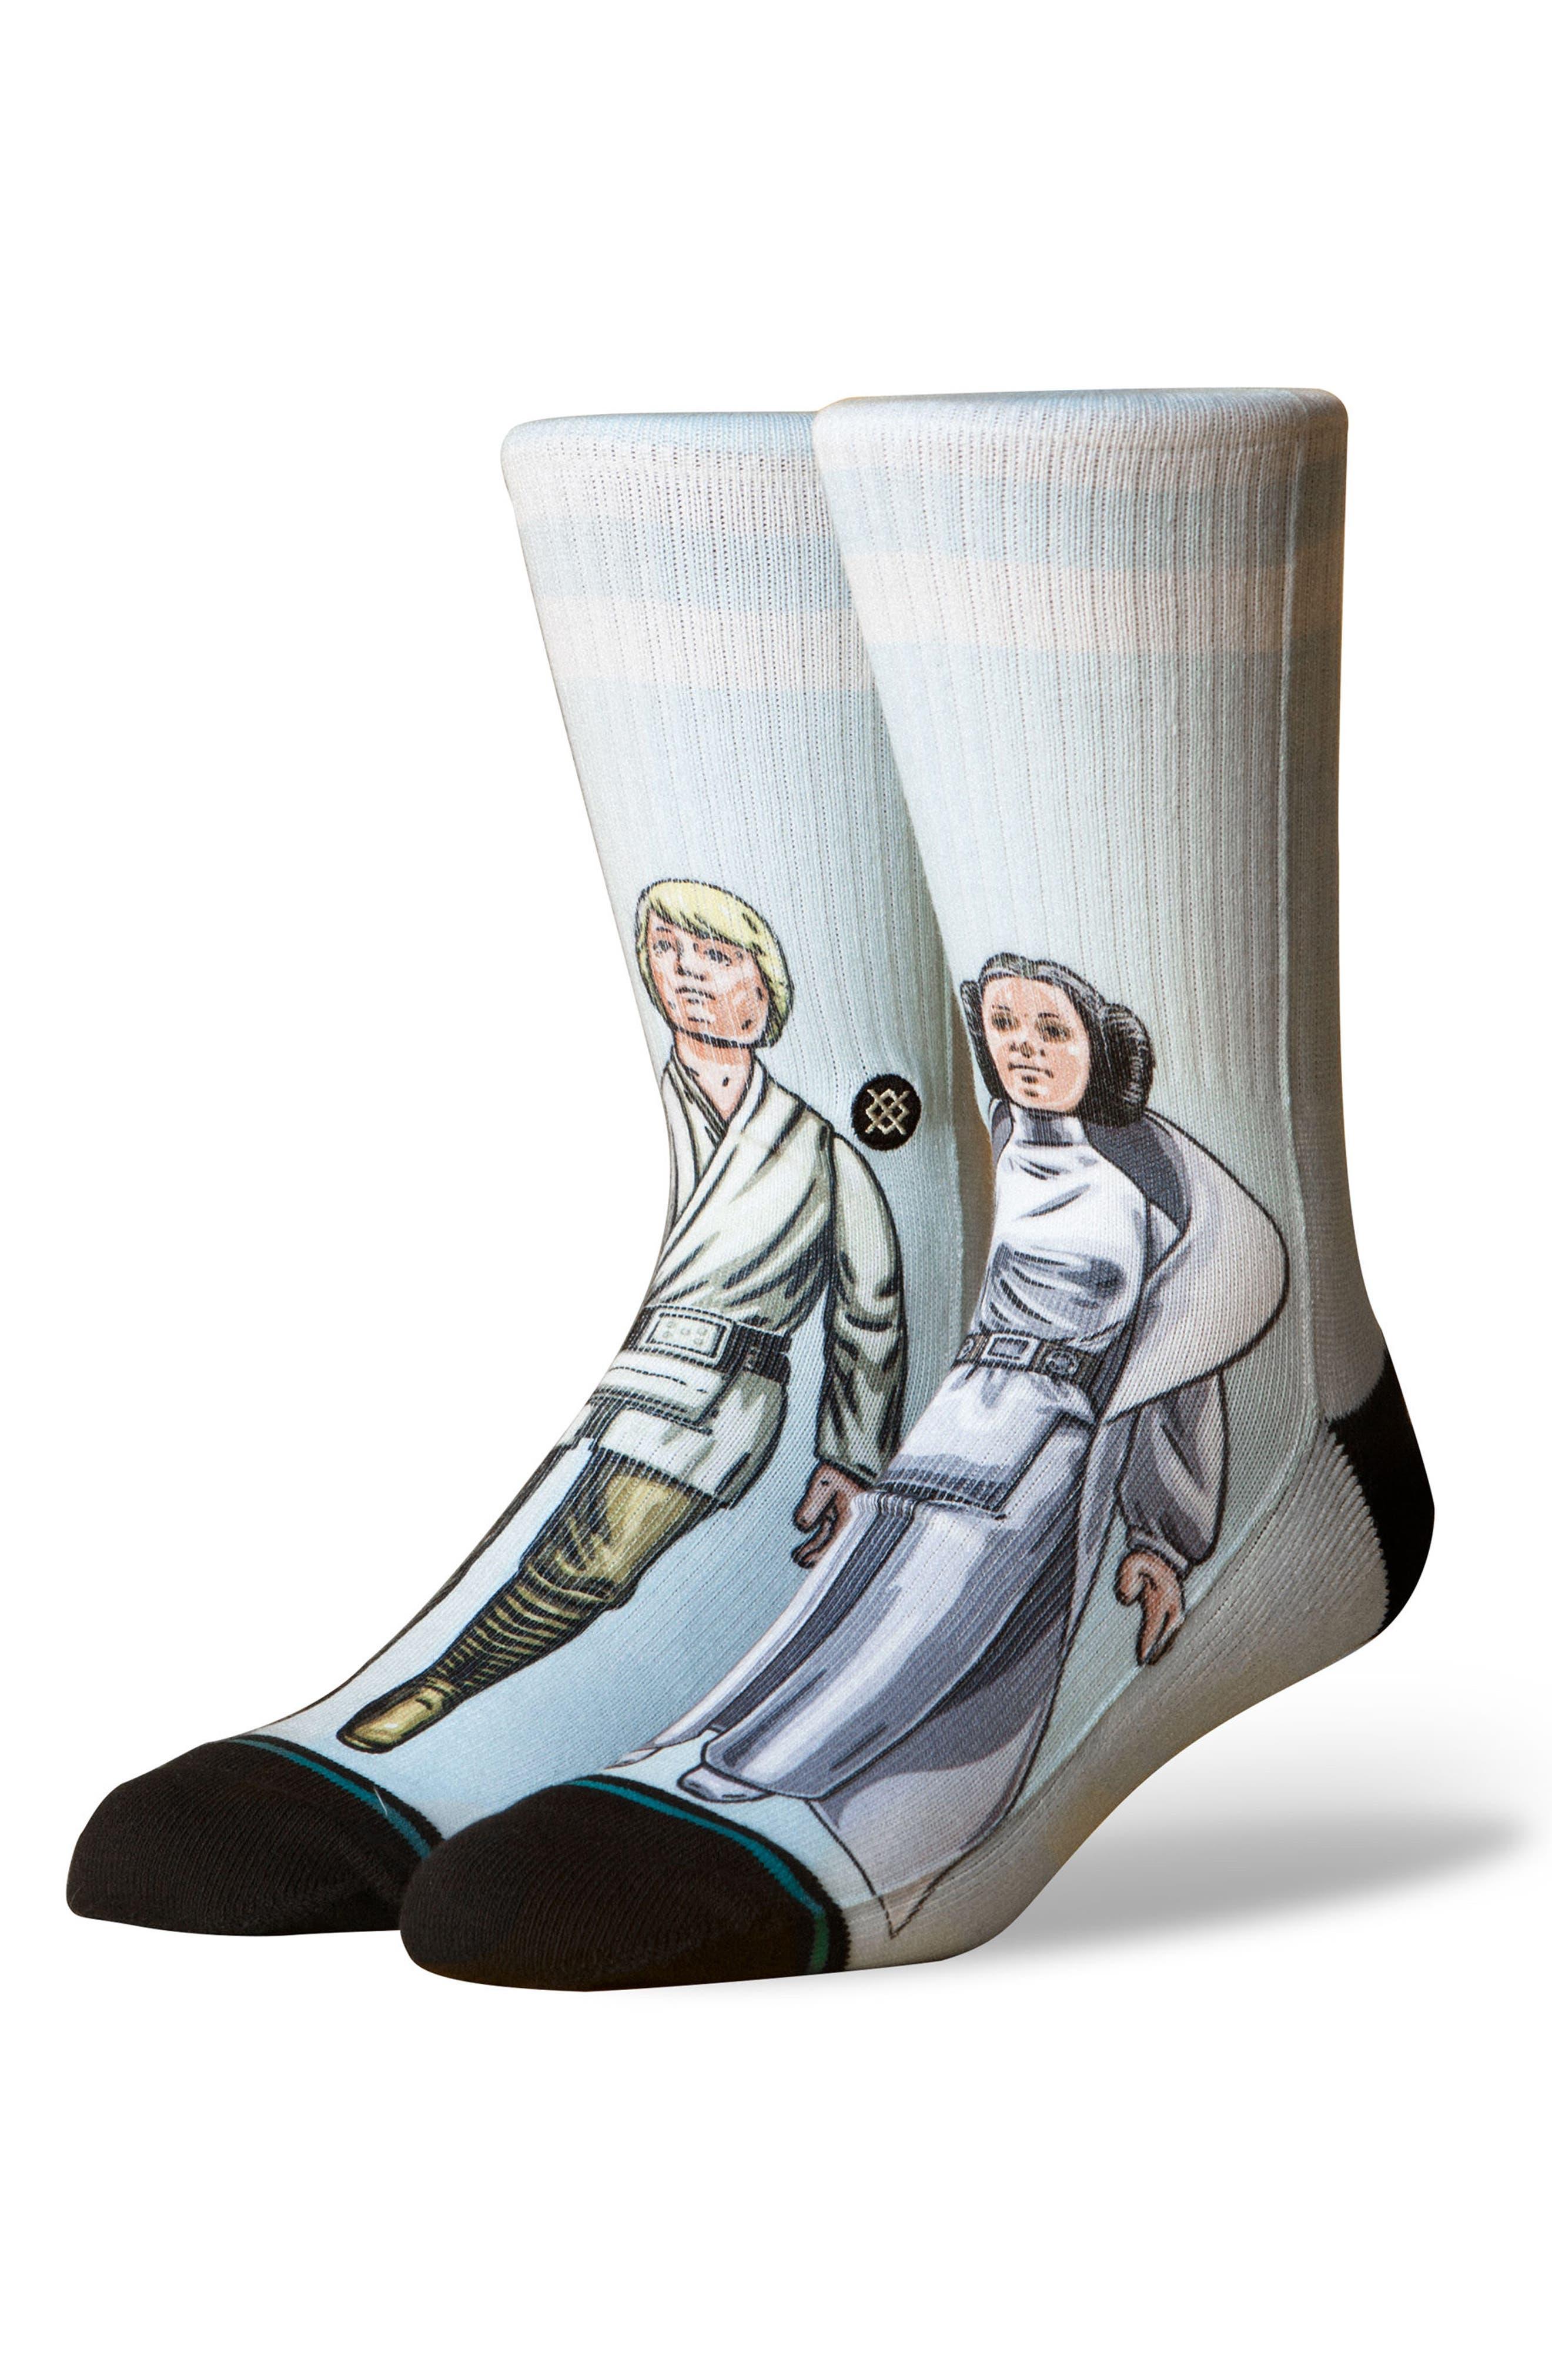 Star Wars<sup>™</sup> Family Force Socks,                             Main thumbnail 1, color,                             Aqua